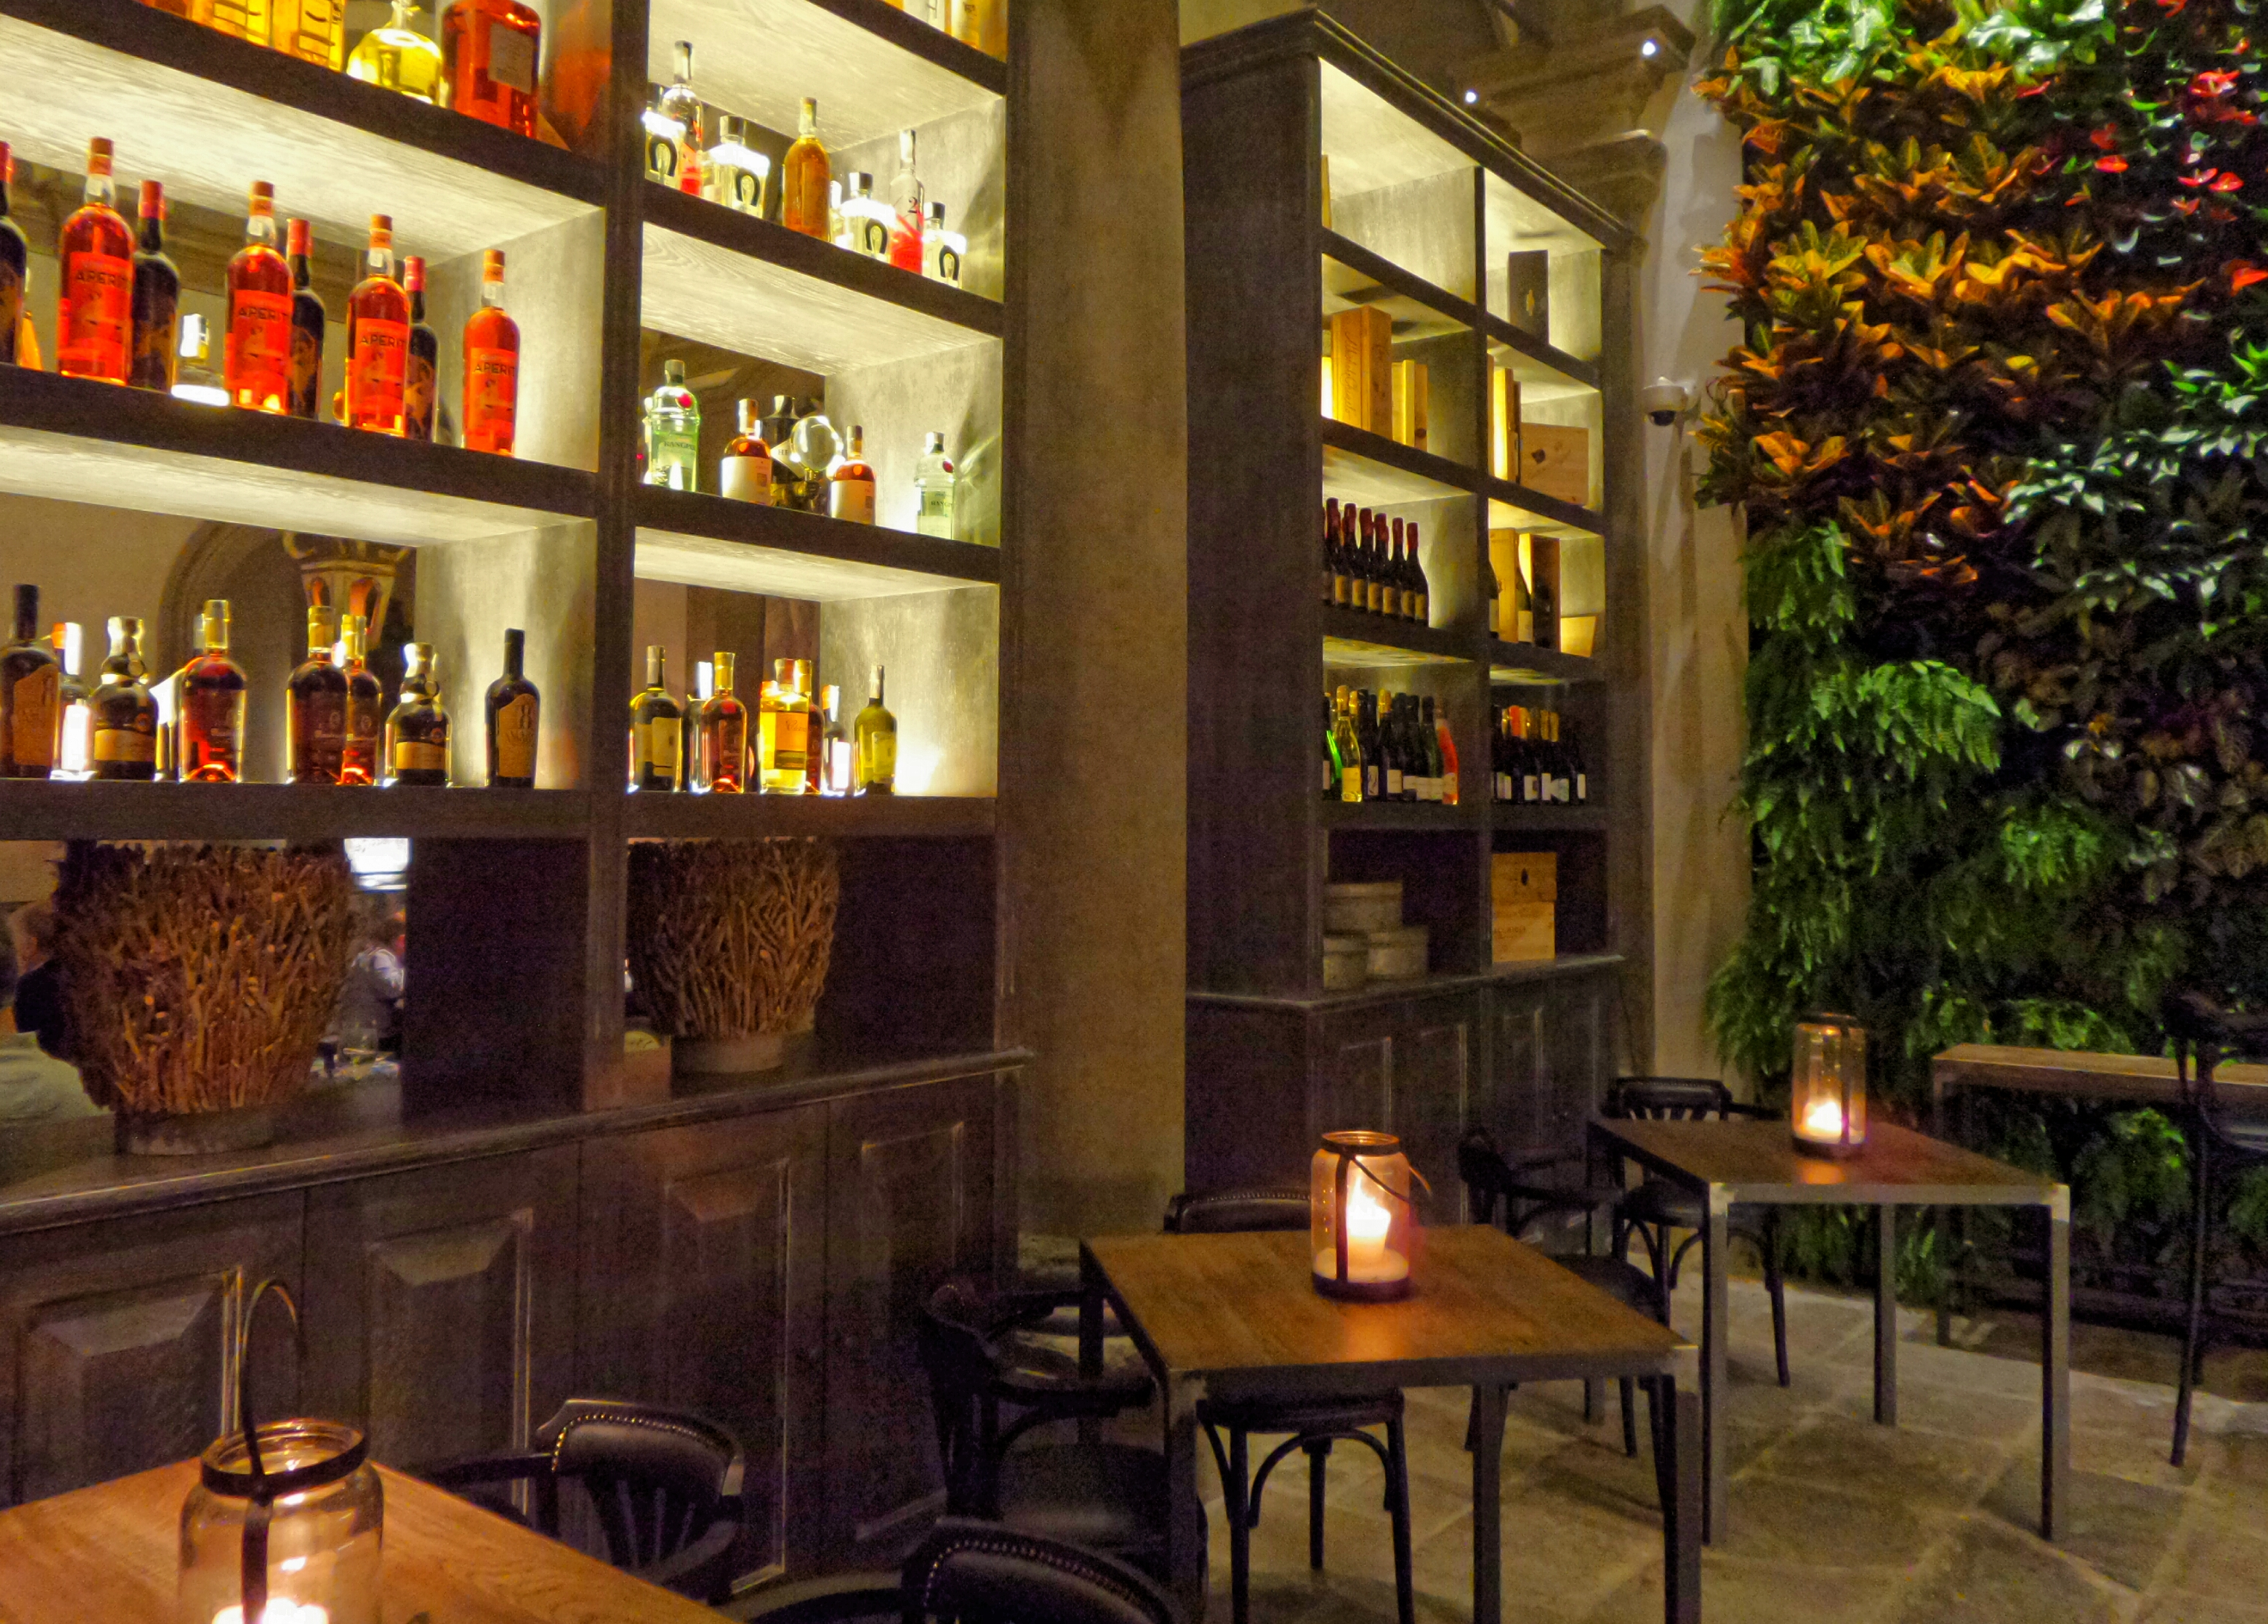 La sala bar sormontata dall'ampia veranda